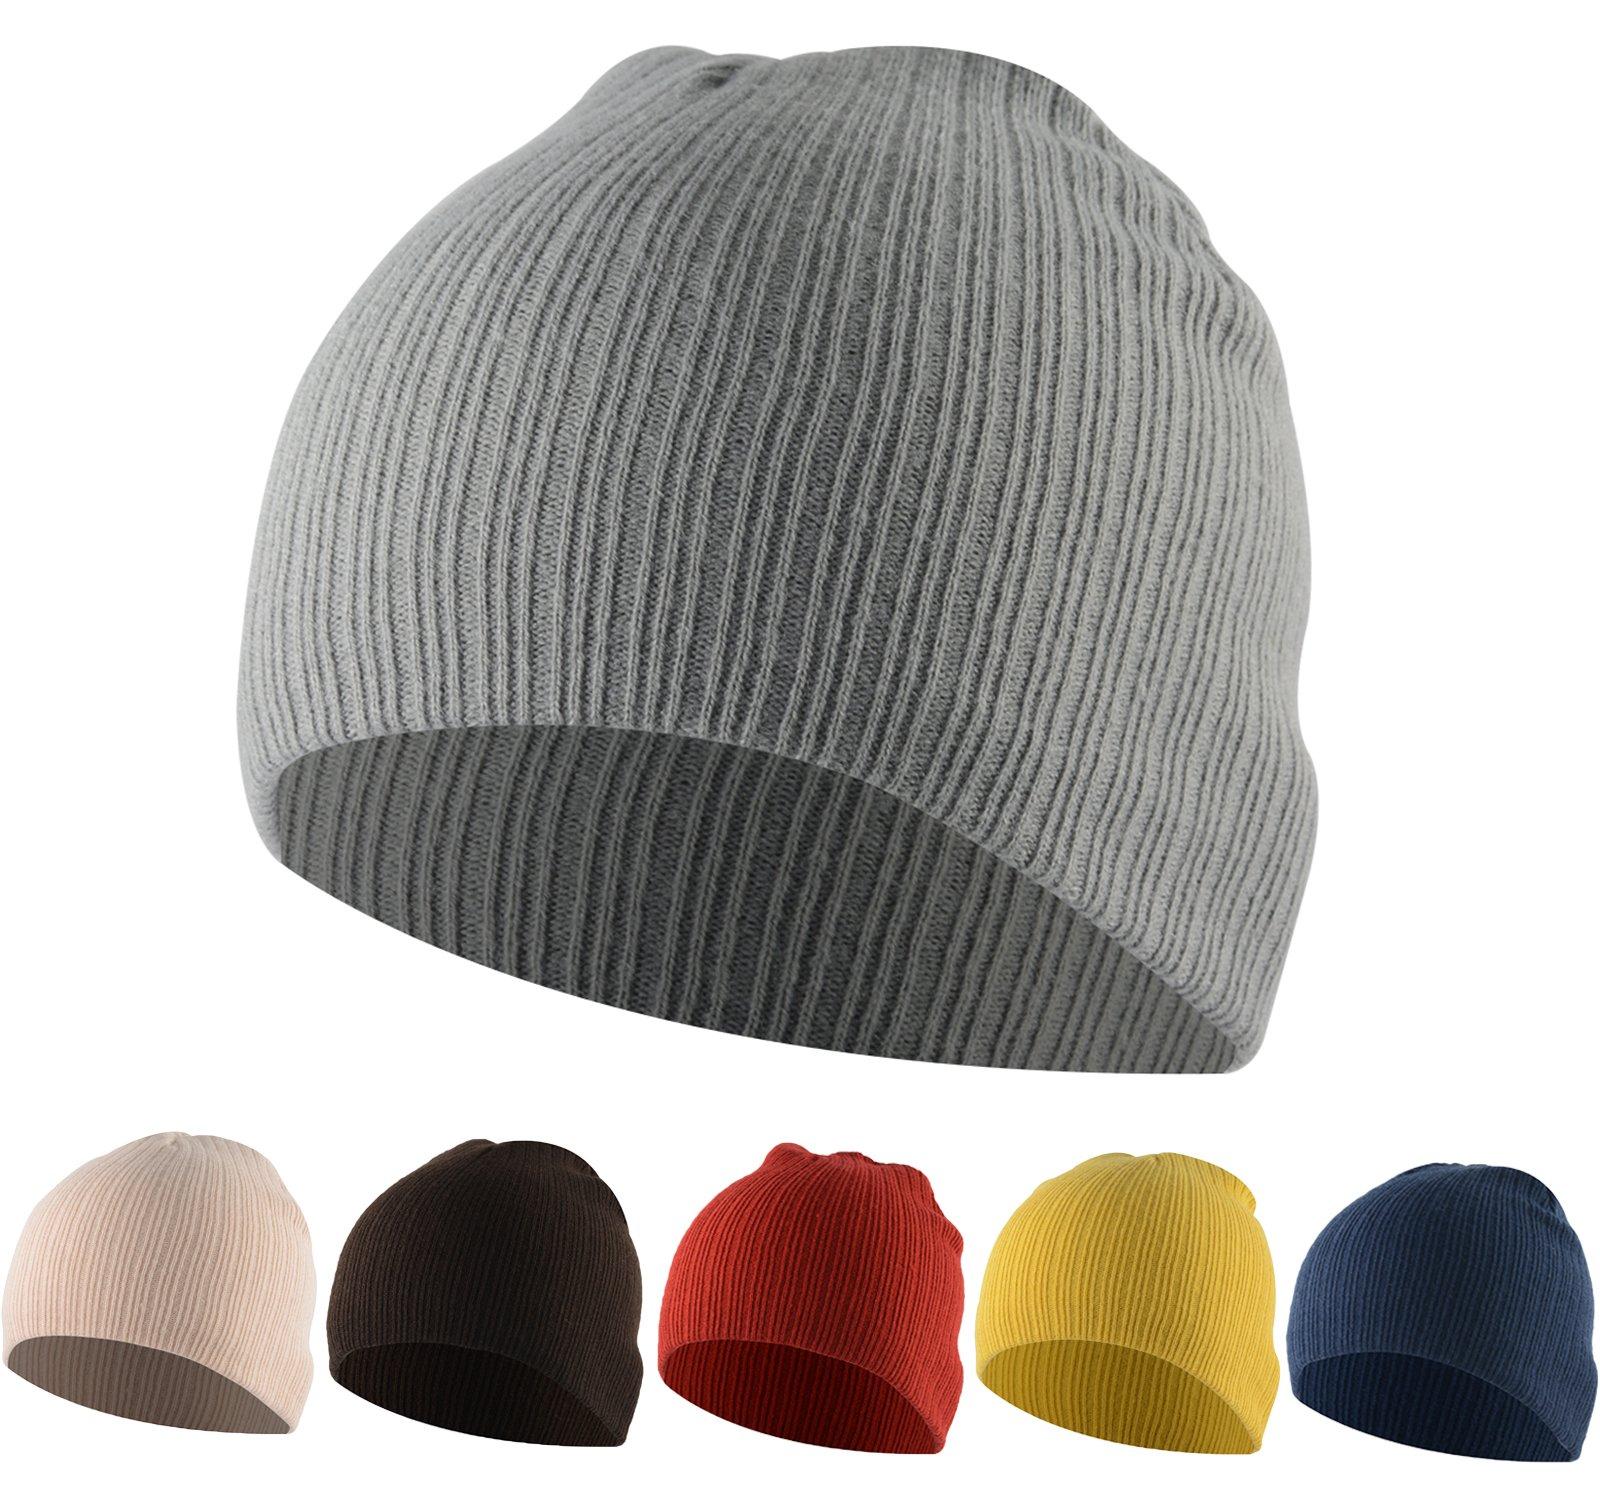 American Trends Toddler Infant Cotton Caps Kids Cute Knit Hat Children Winter Cozy Crochet Multicolor Beanie 6 Pack Beanies